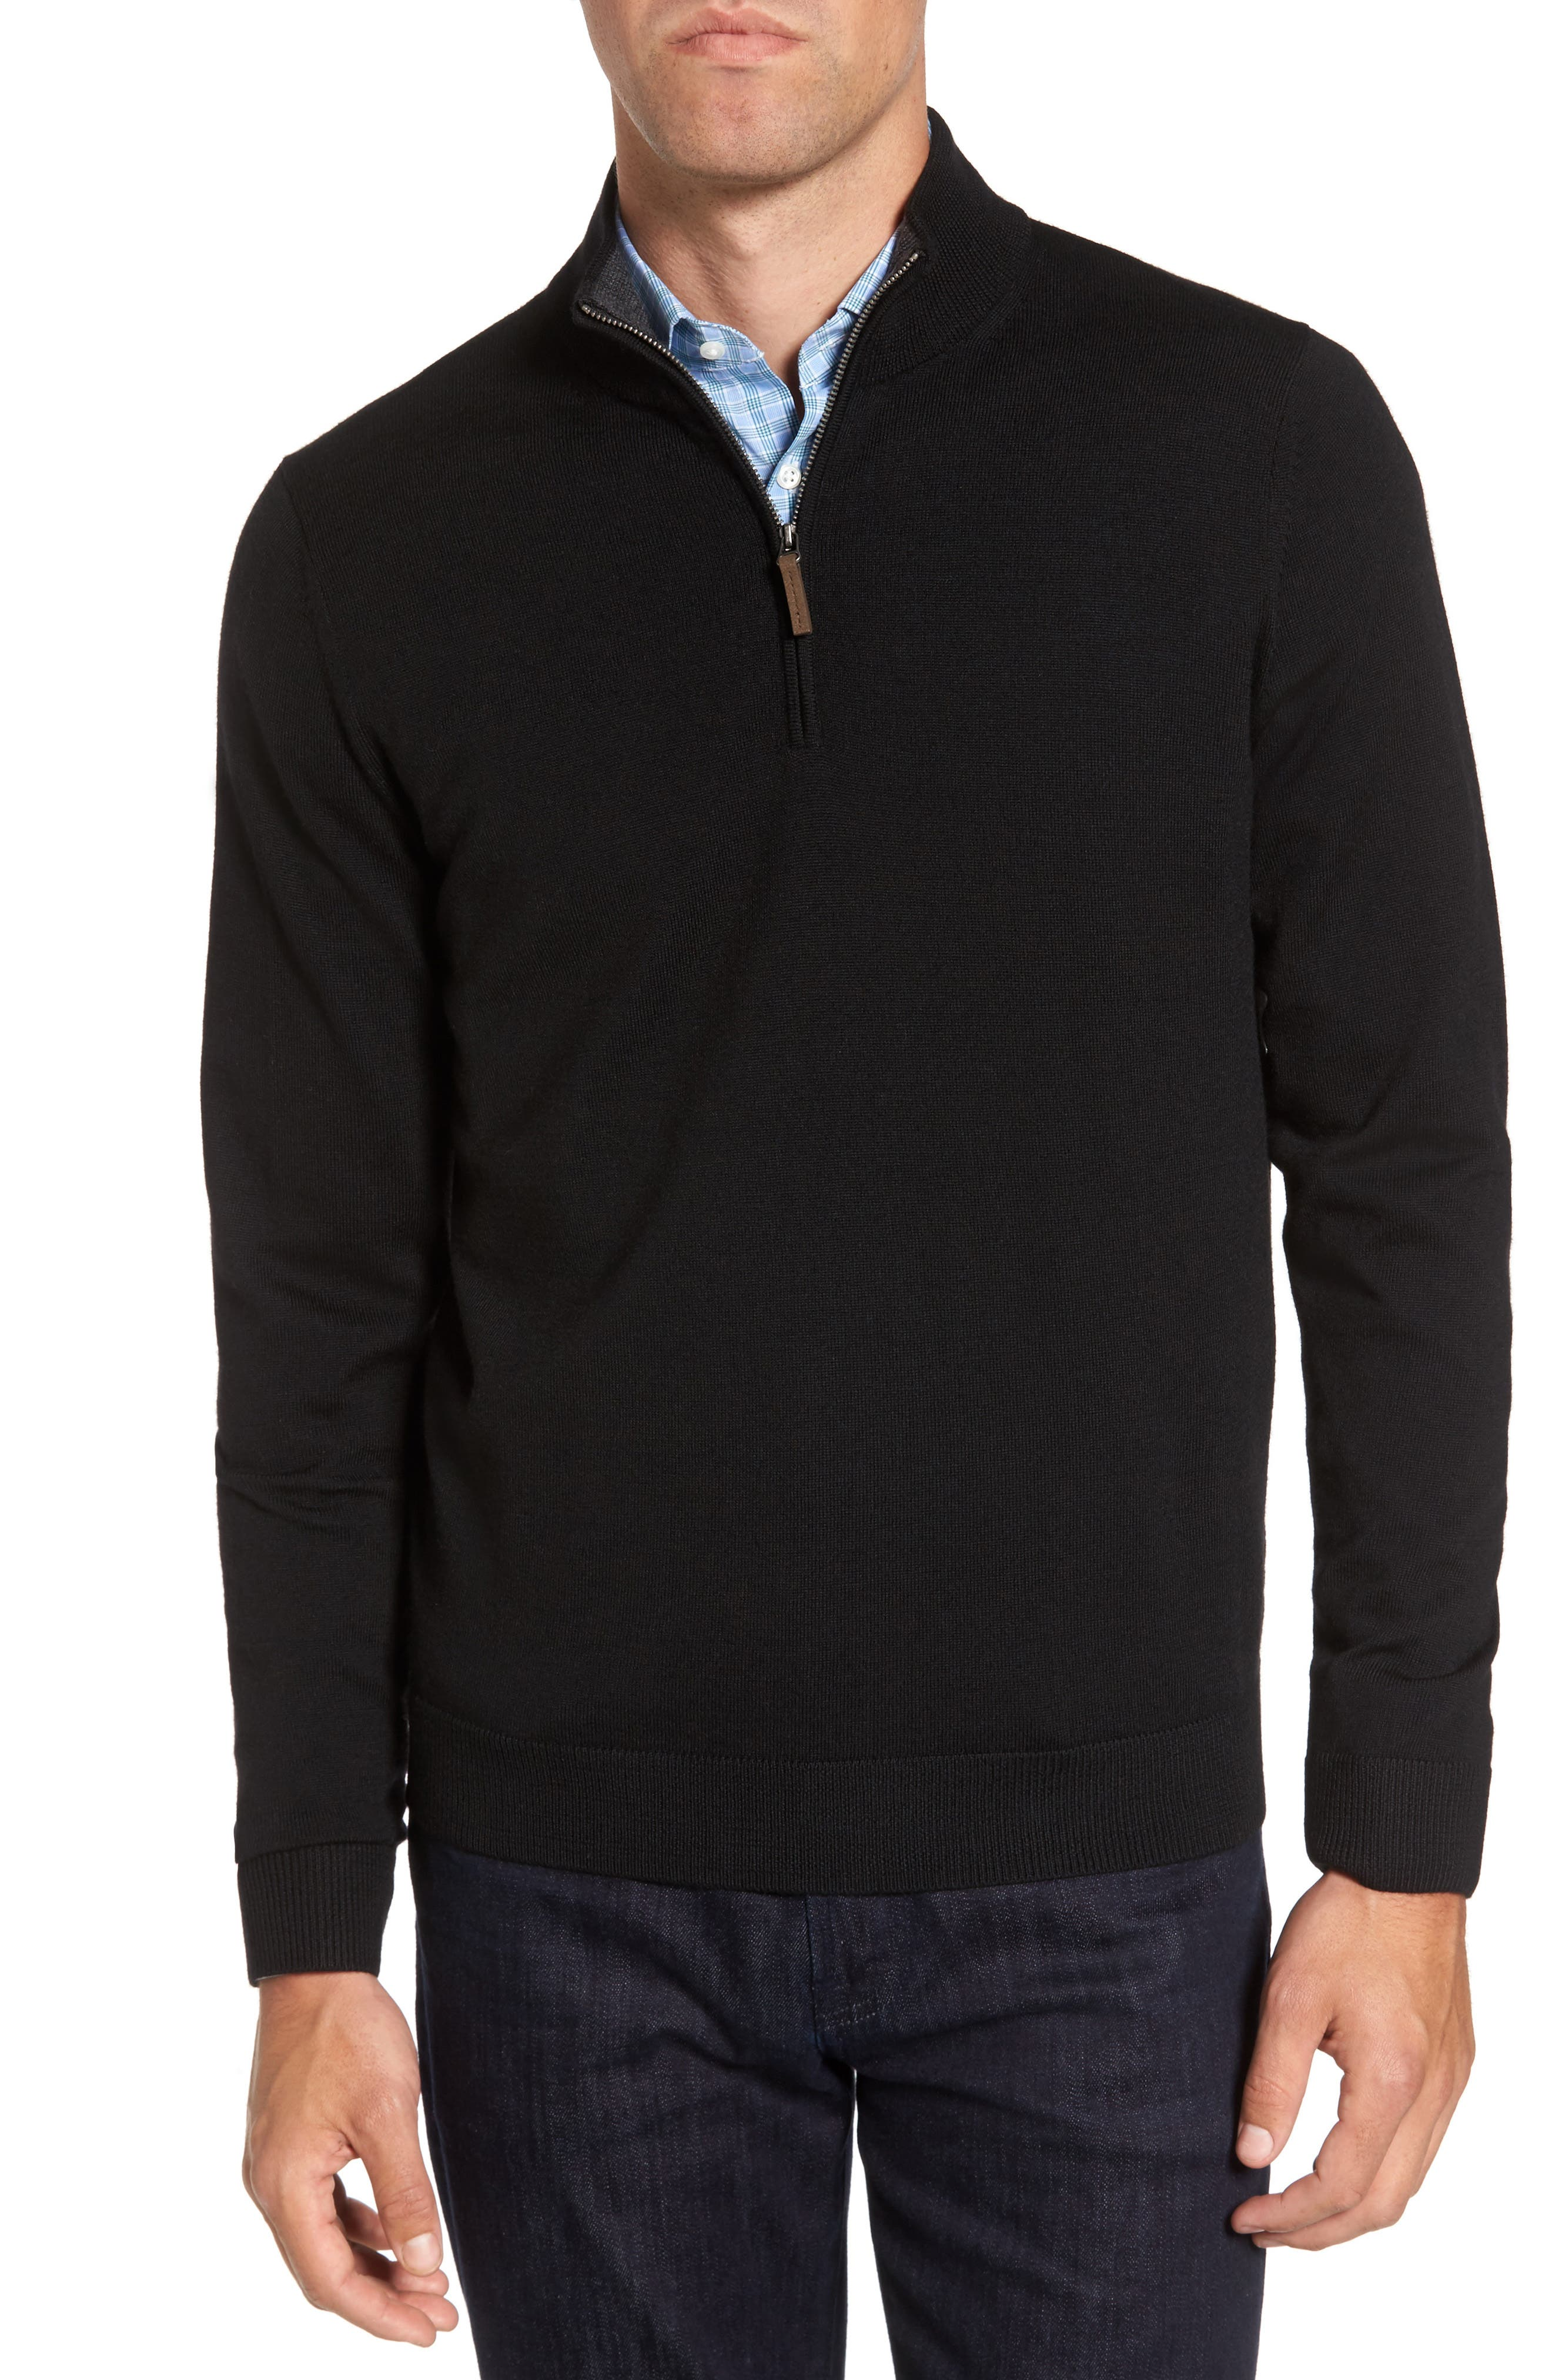 Black Sweater Shirt